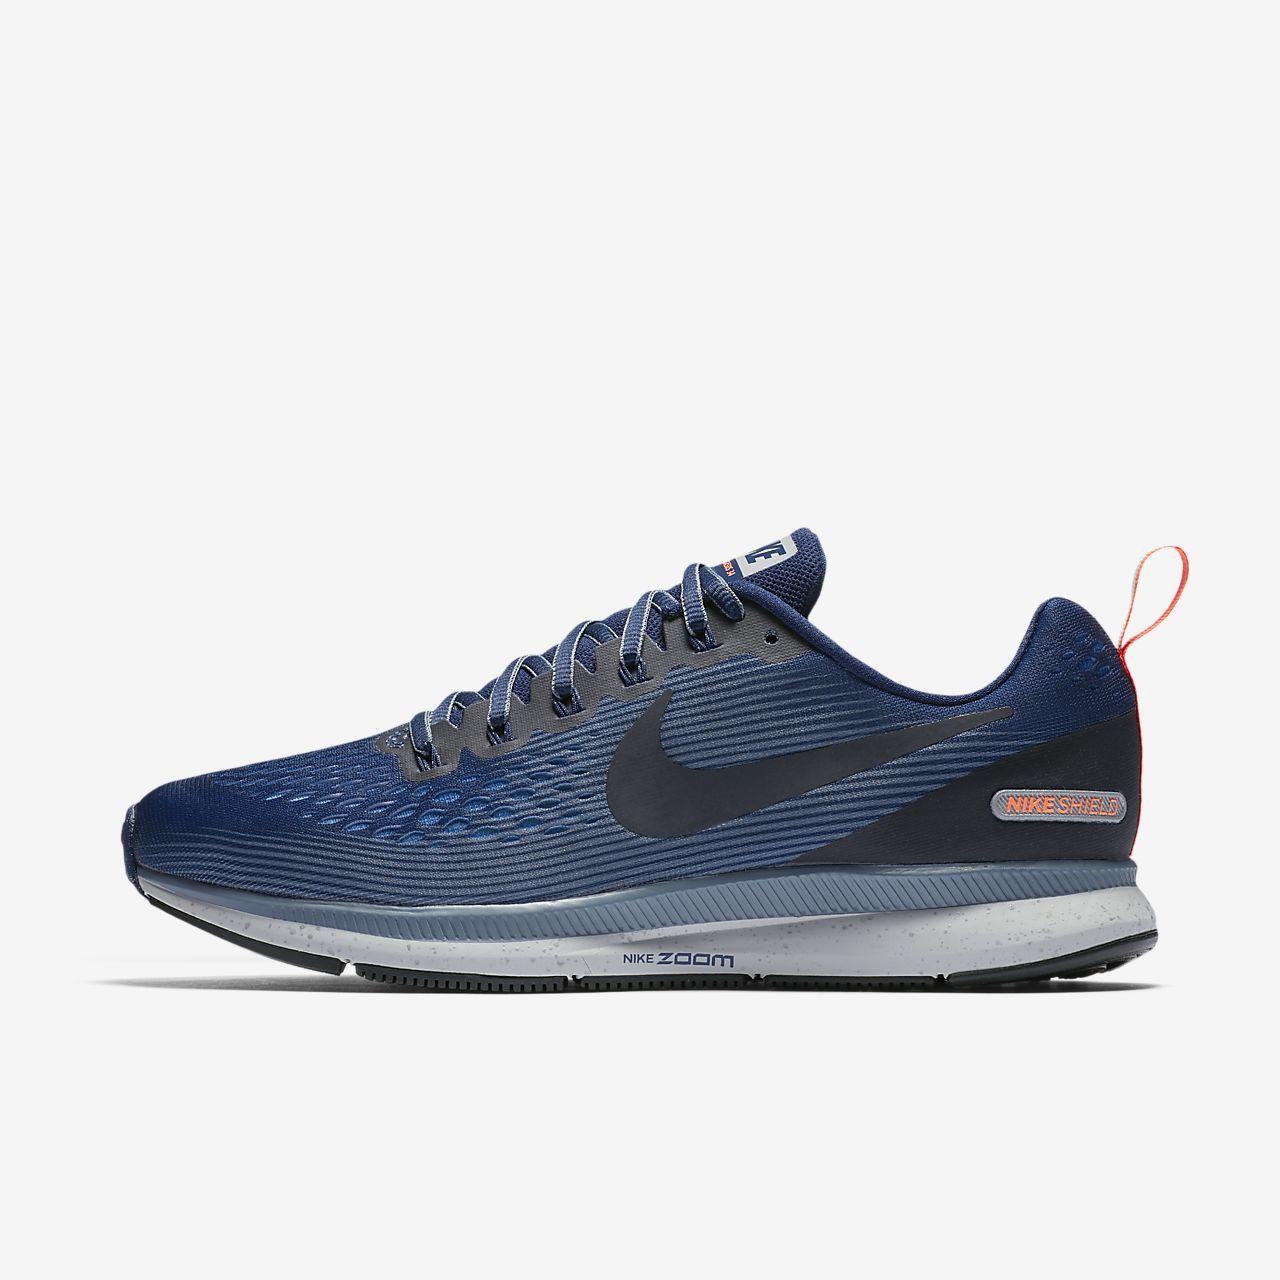 Nike Air Zoom Pegasus 34 Shield Men S Running Shoe Running Shoes For Men Sneakers Sneakers Fashion